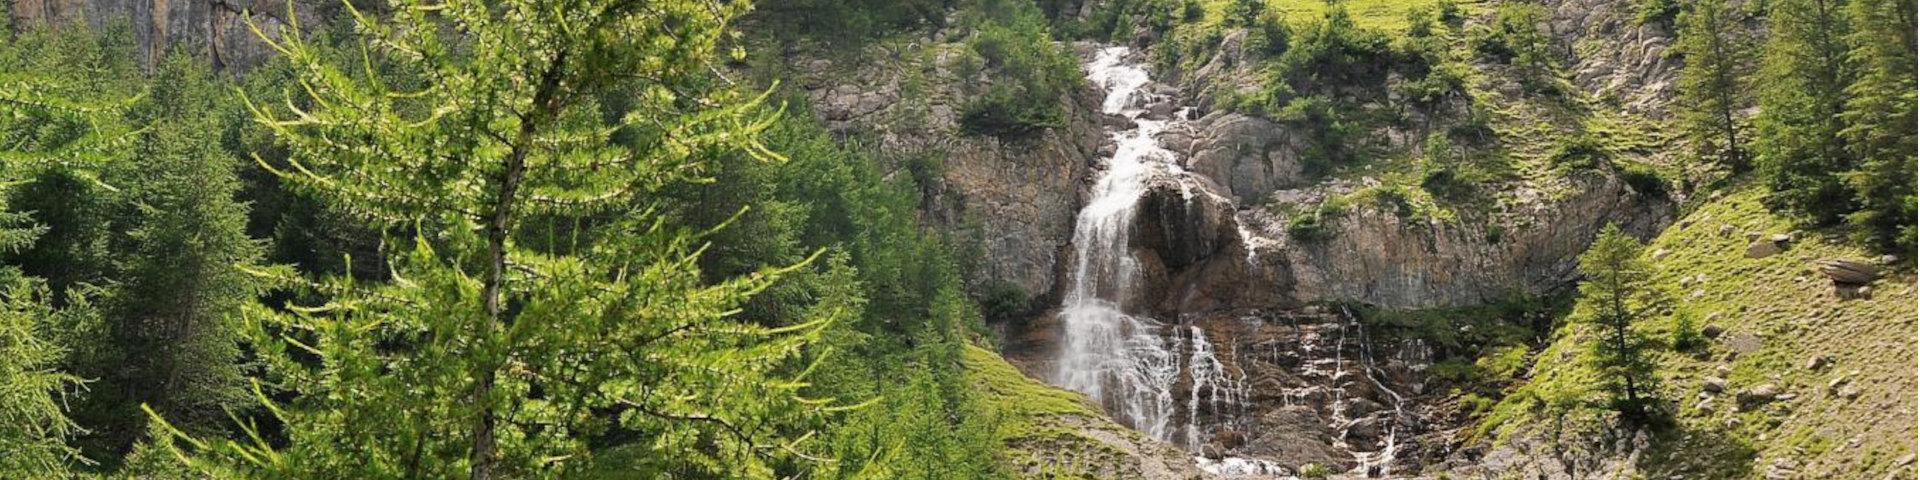 banniere cascade